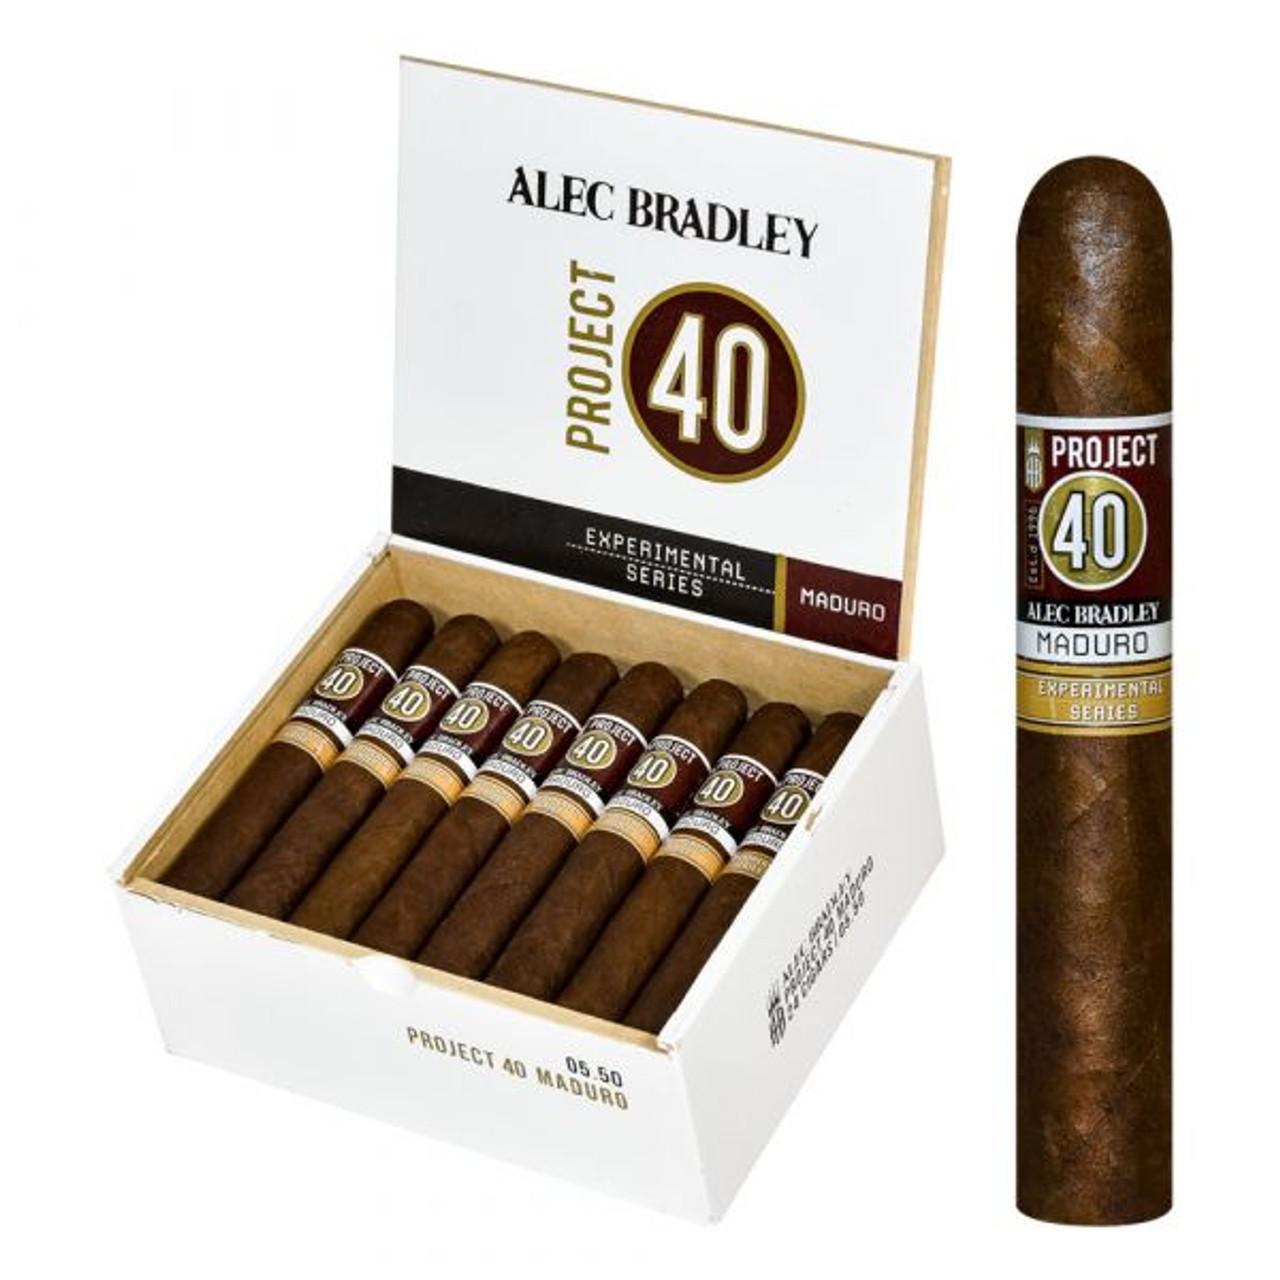 Alec Bradley Project 40 Maduro - Robusto